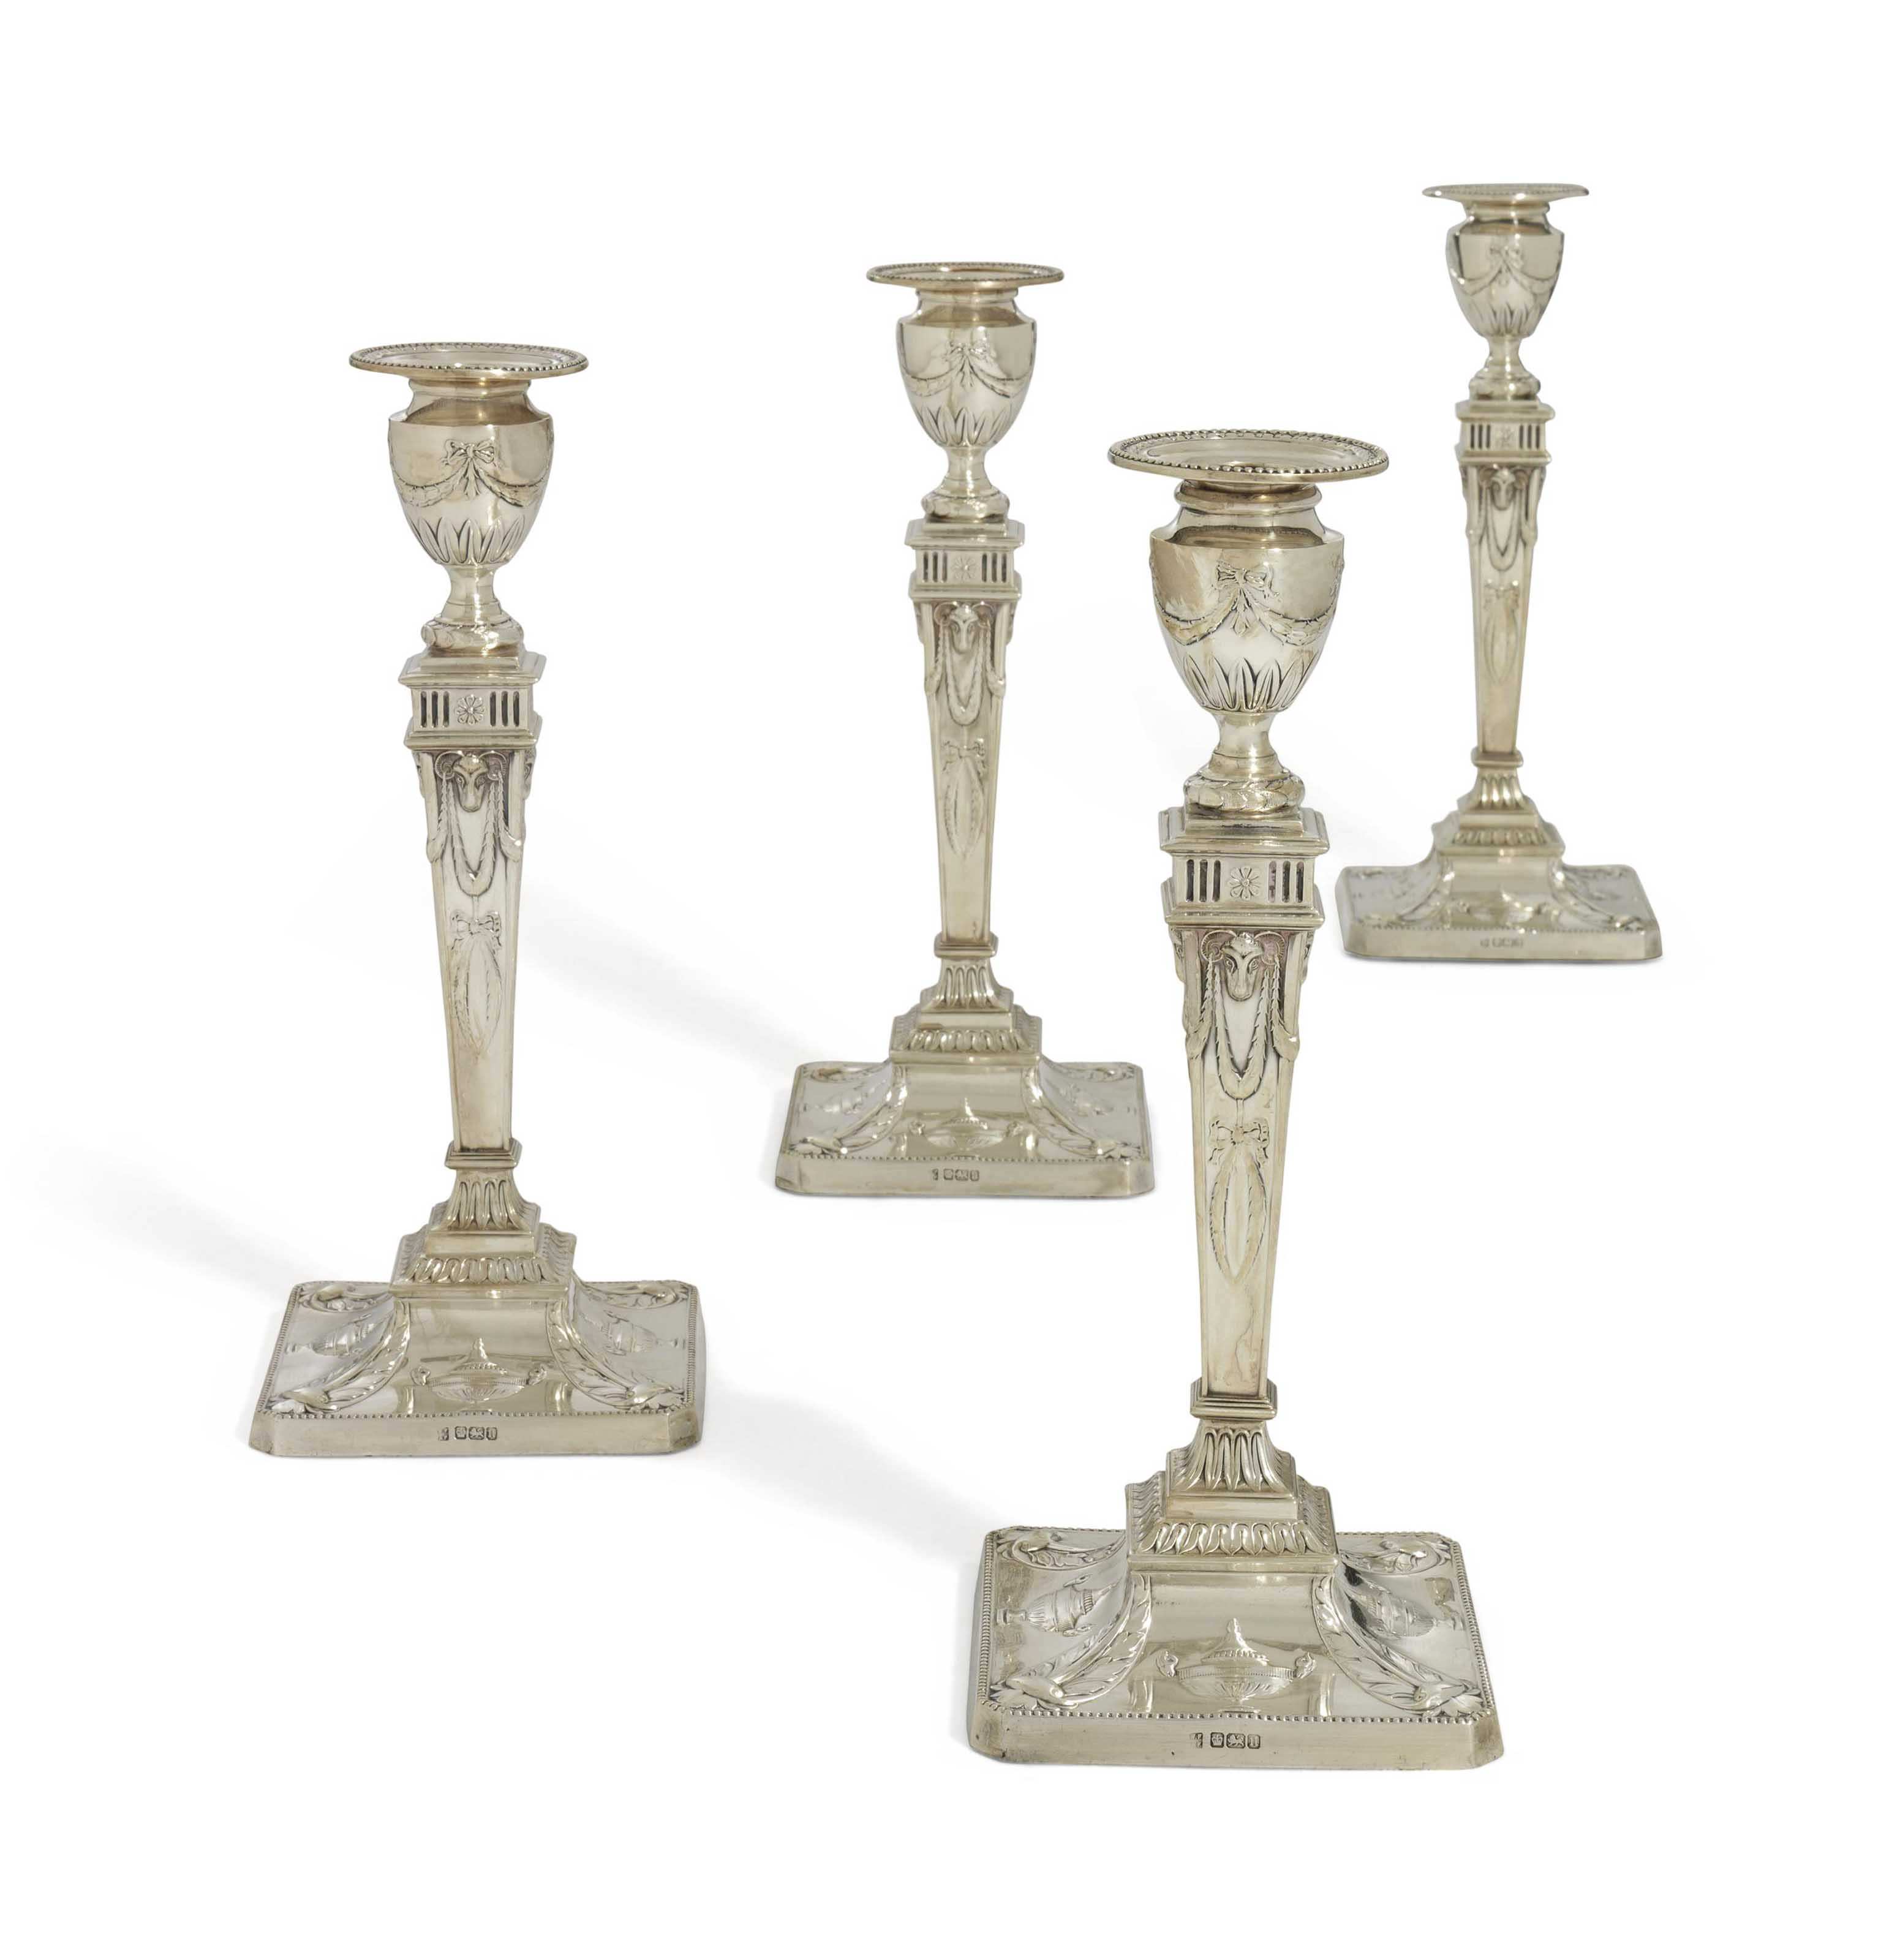 A SET OF FOUR EDWARD VII SILVER CANDLESTICKS